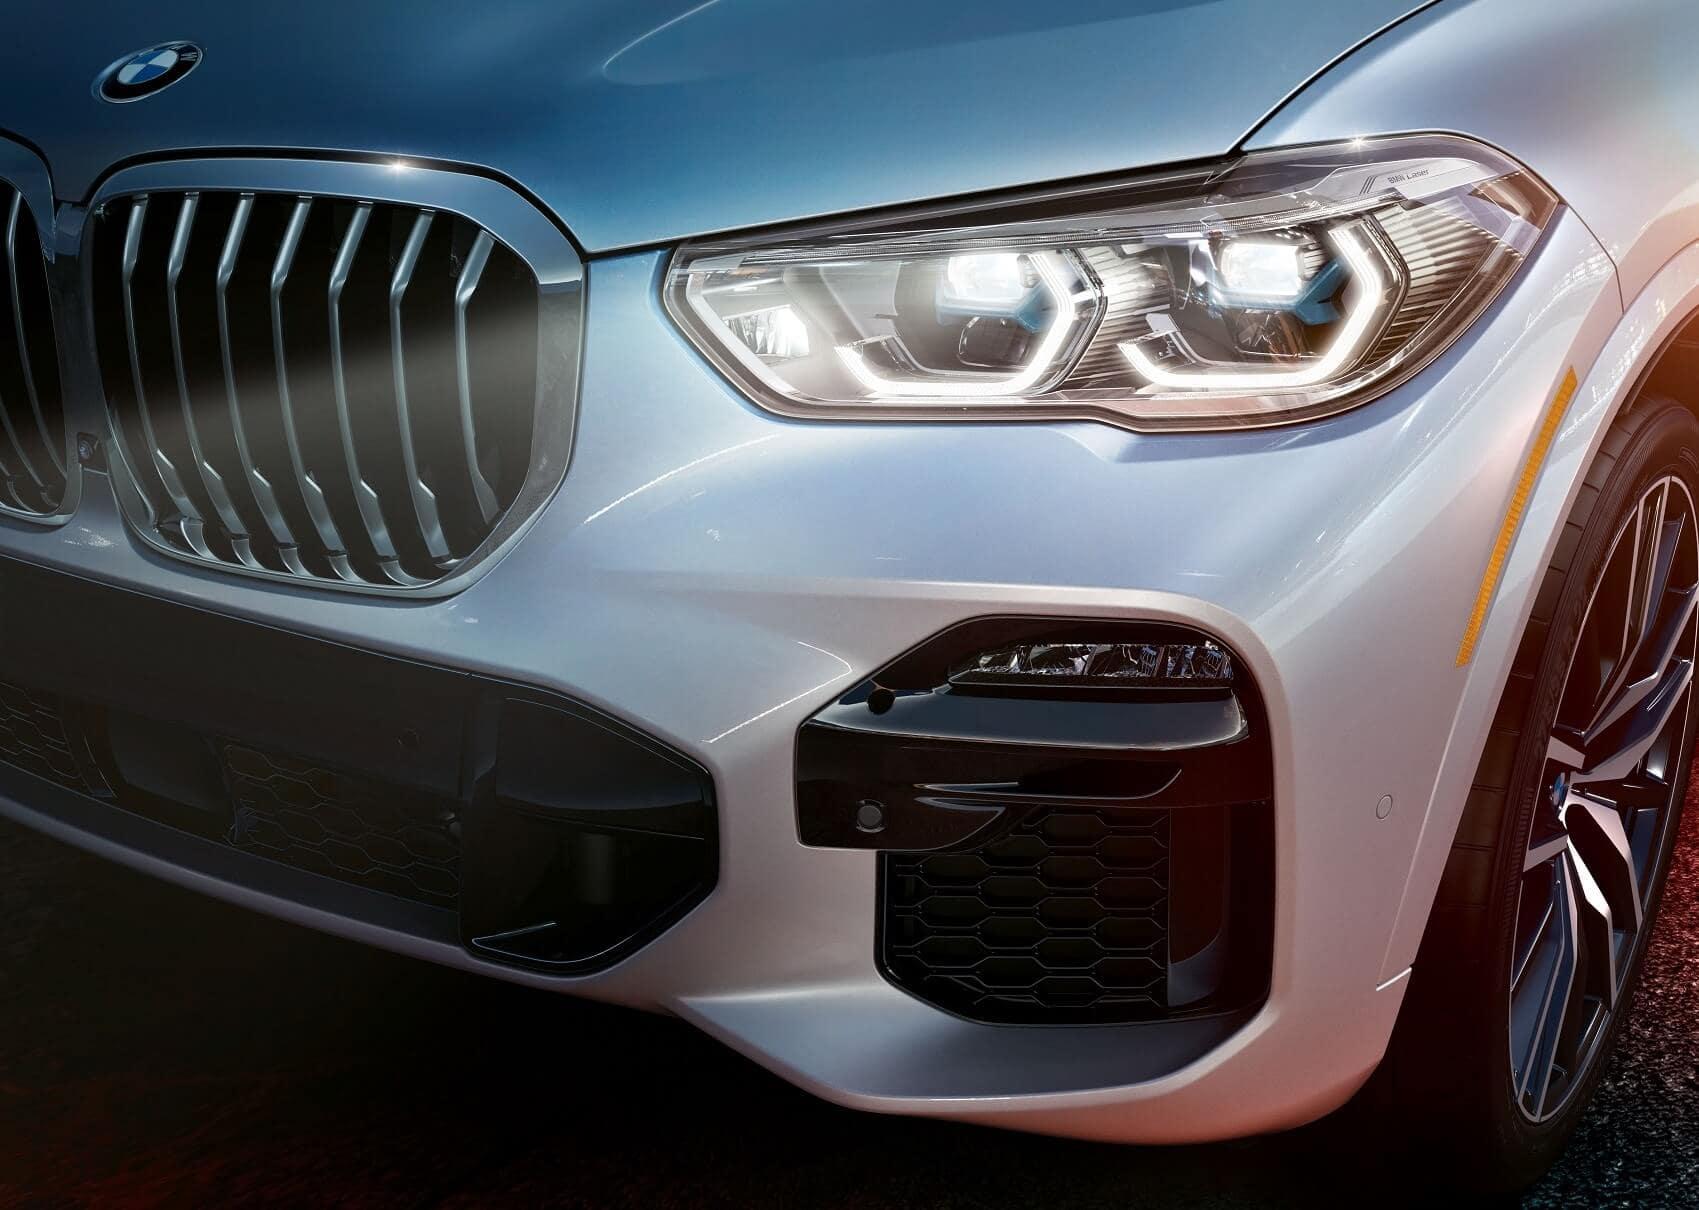 BMW X5 LED headlights